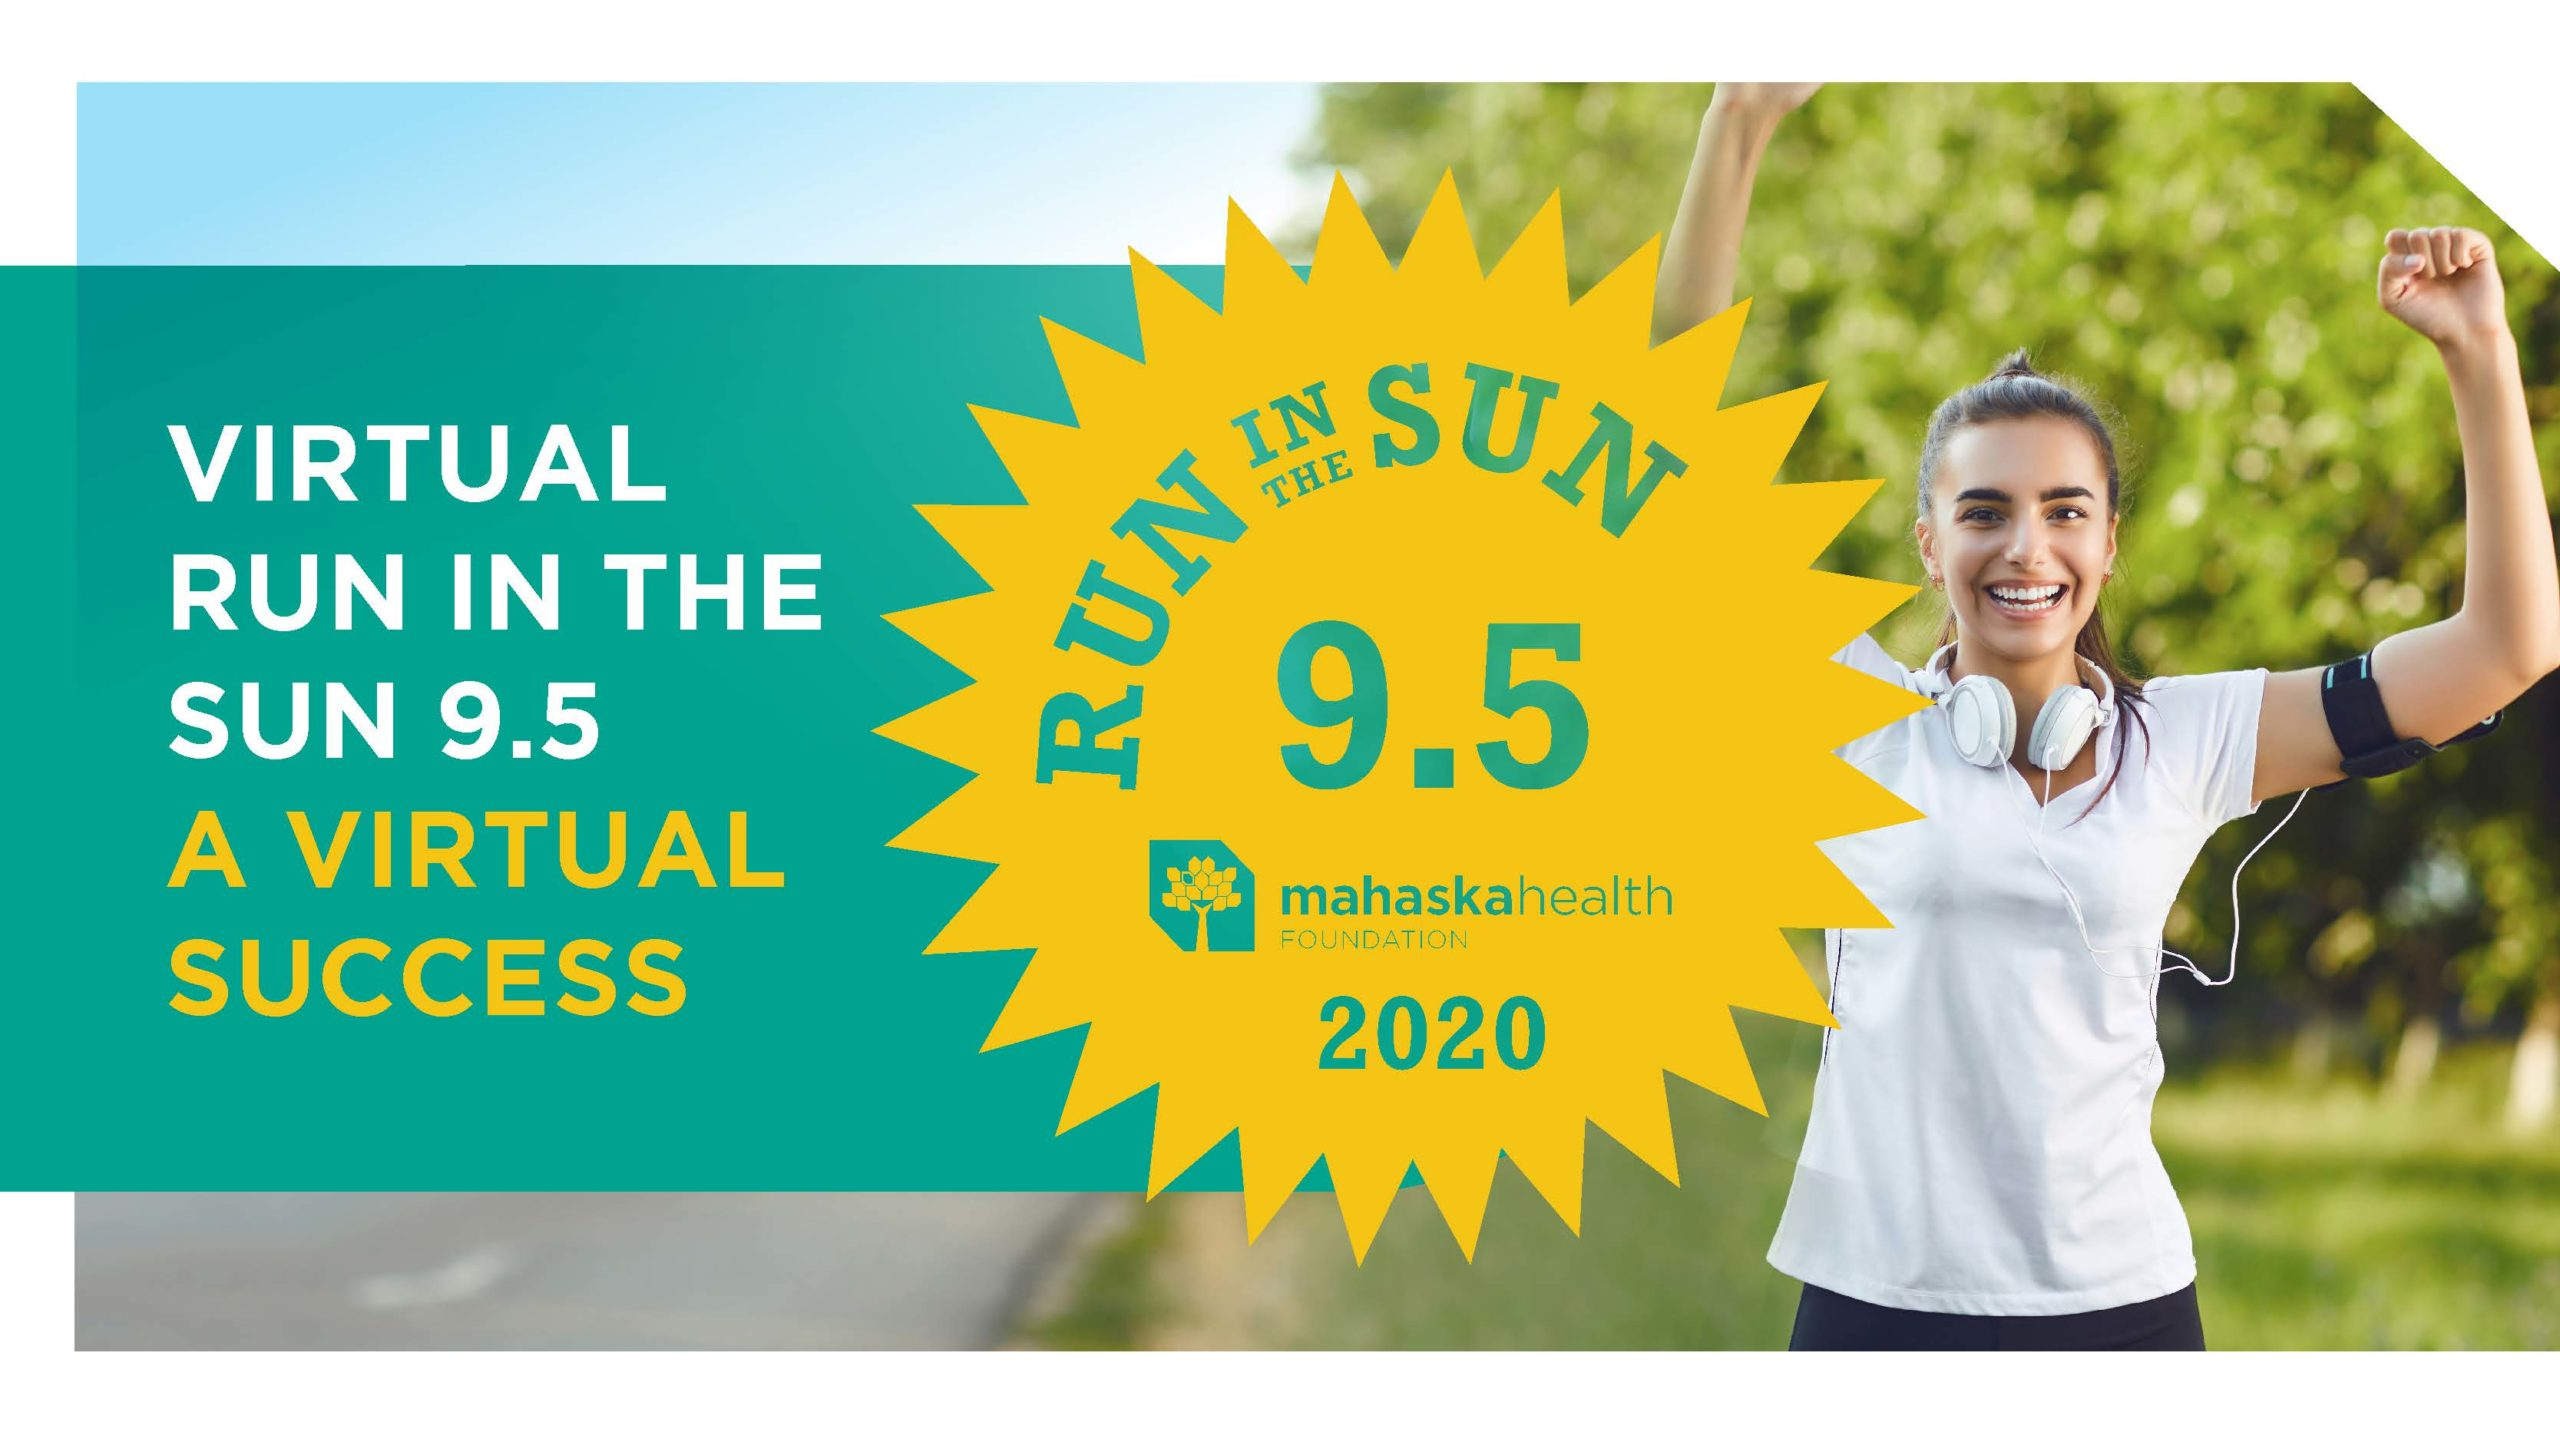 Mahaska Health Foundation's Run in the Sun 9.5 a 'Virtual' Hit 1